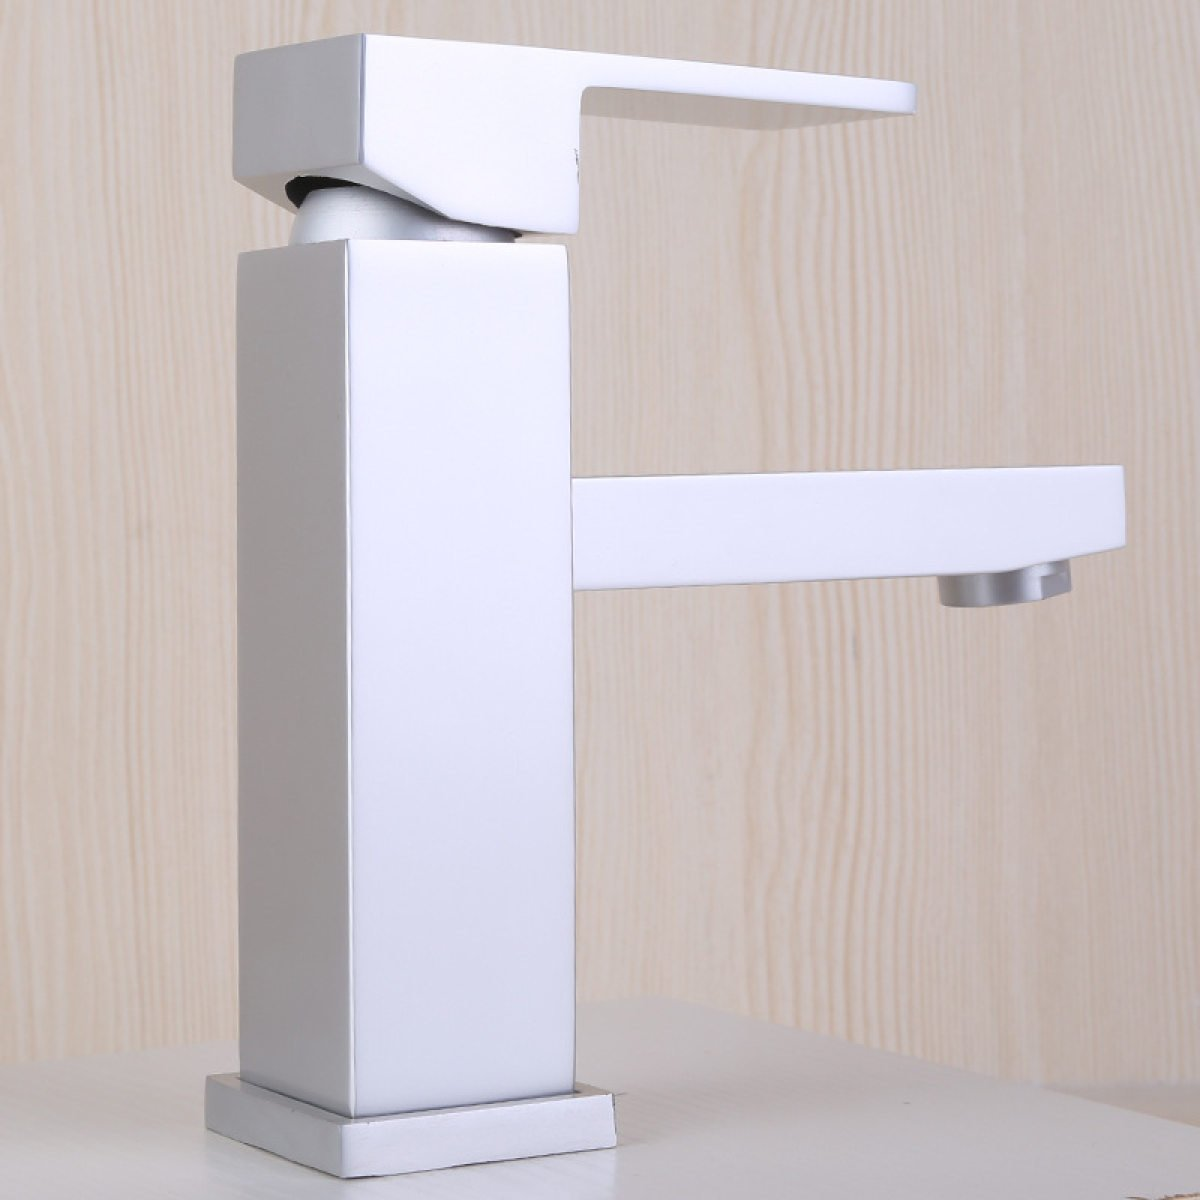 LDONGSH Space Aluminum Double Hole Basin Bathroom Hotel Bathroom Faucet Tap